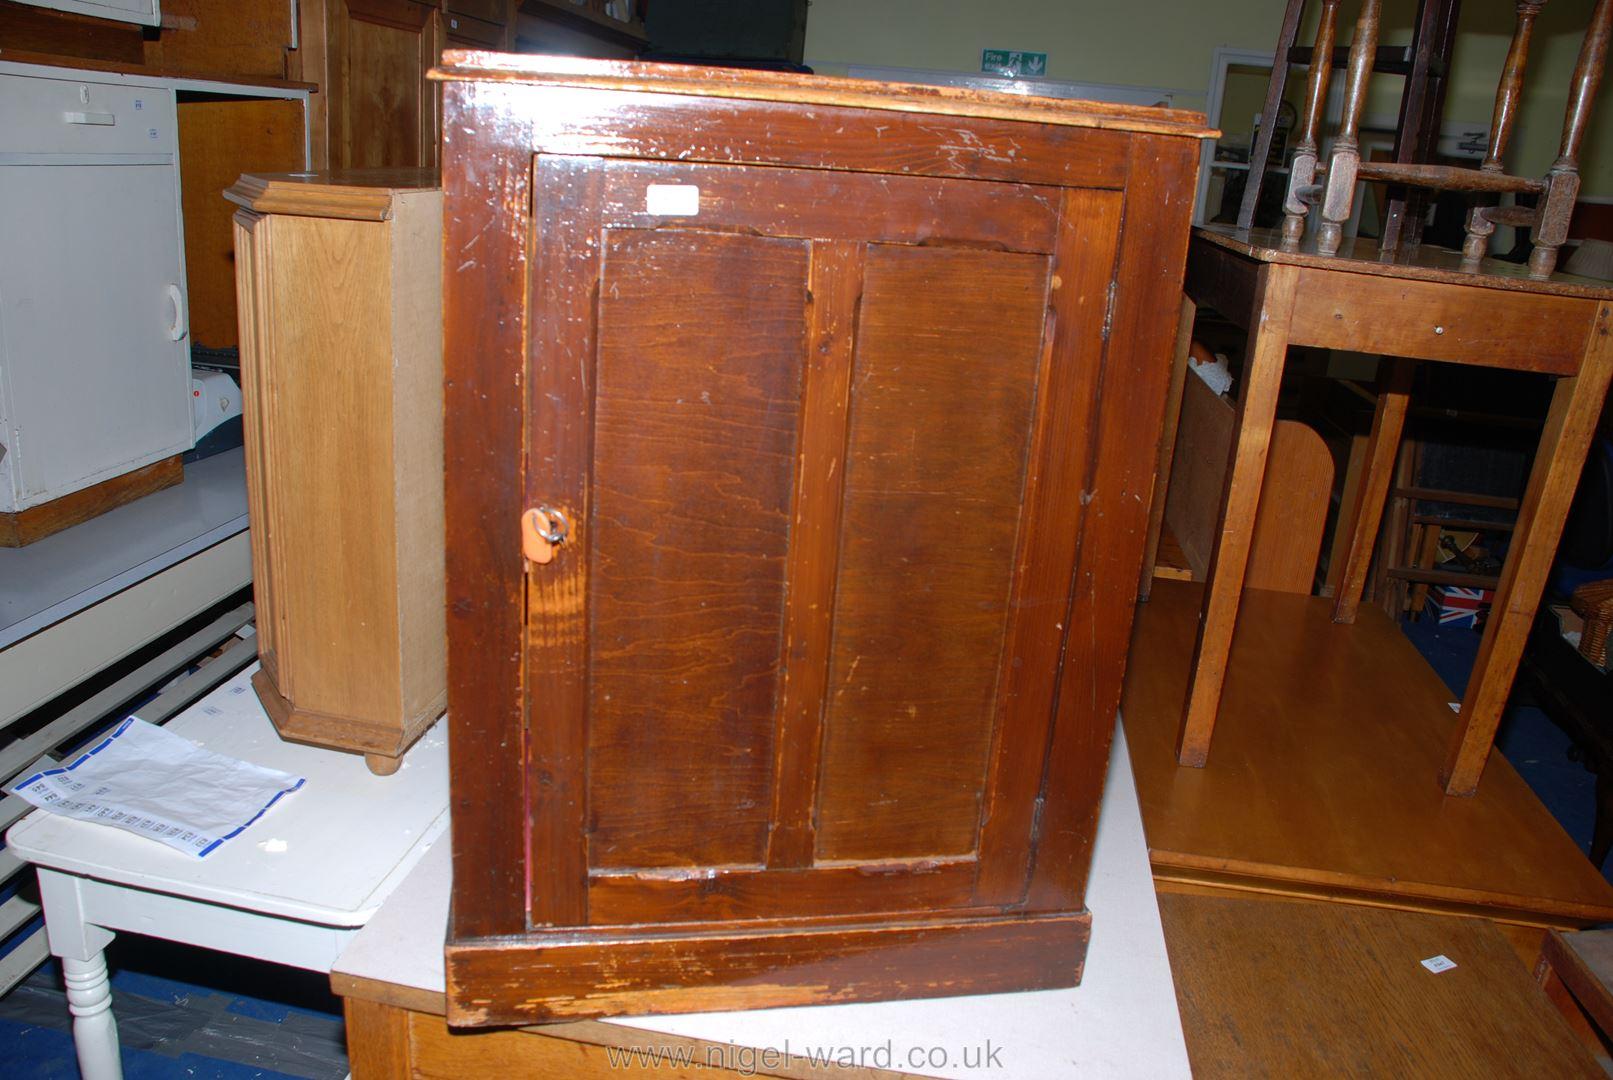 "A single door, single-shelf cupboard with key, 25"" x 17"" x 33 1/2"" high."